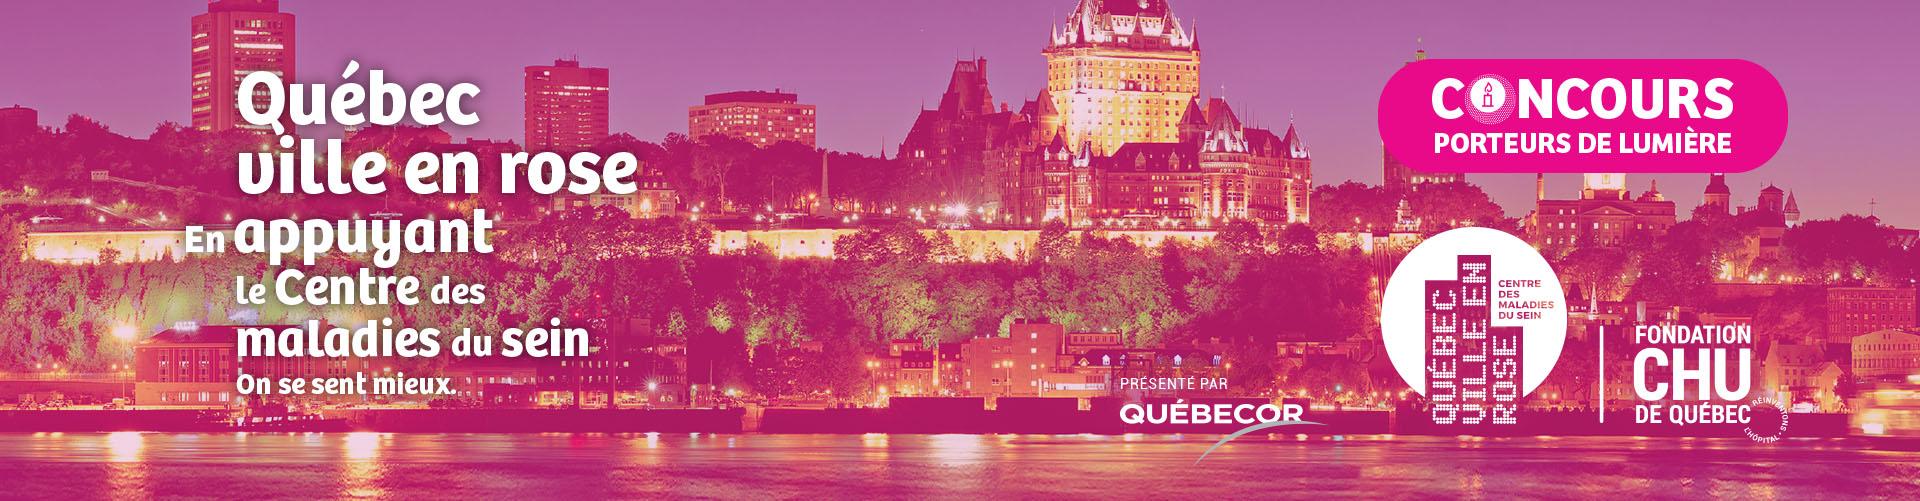 Bandeau Québec ville en rose